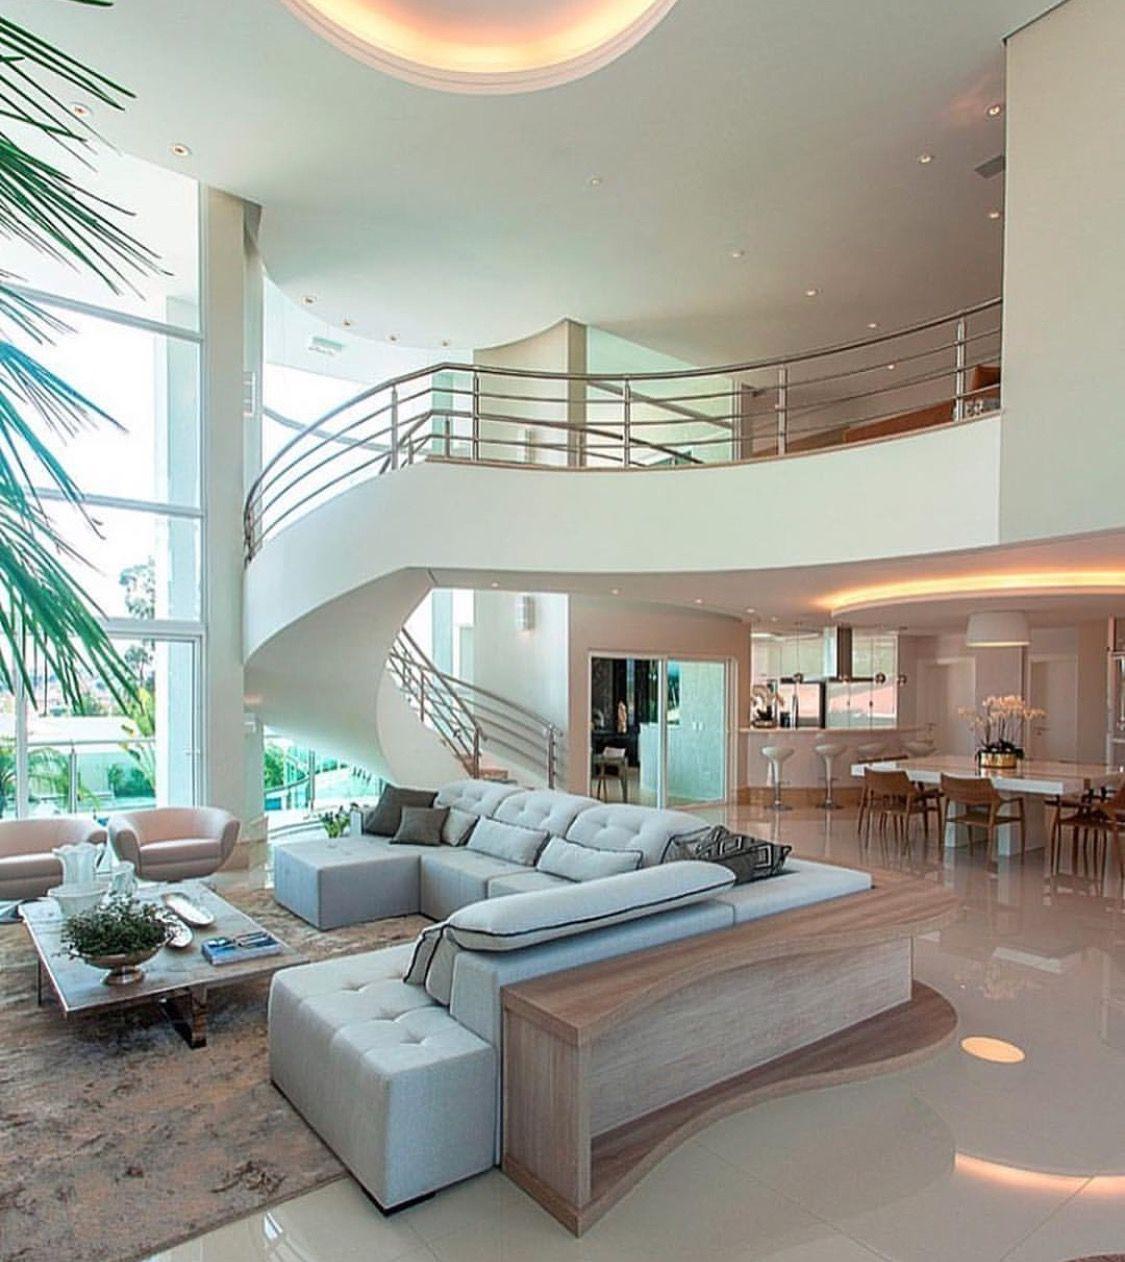 16 Absolutely Gorgeous Mediterranean Dining Room Designs: Home Interior Design, Dream